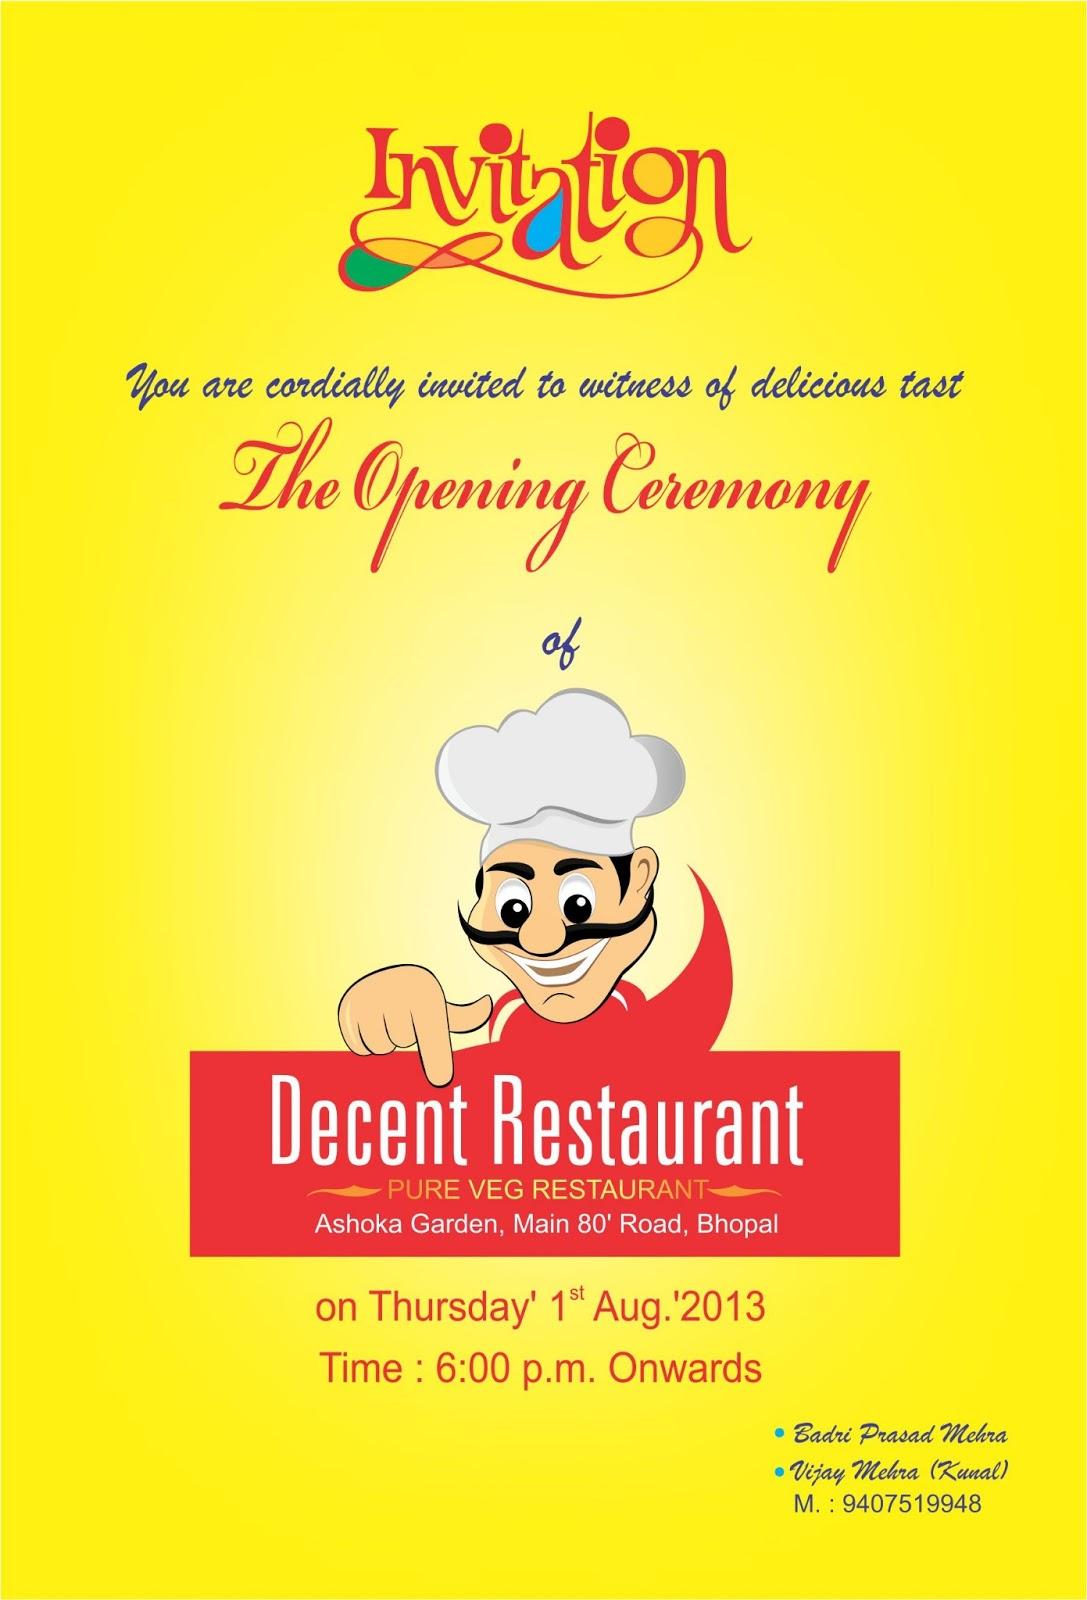 Restaurant Opening Invitation Card Design